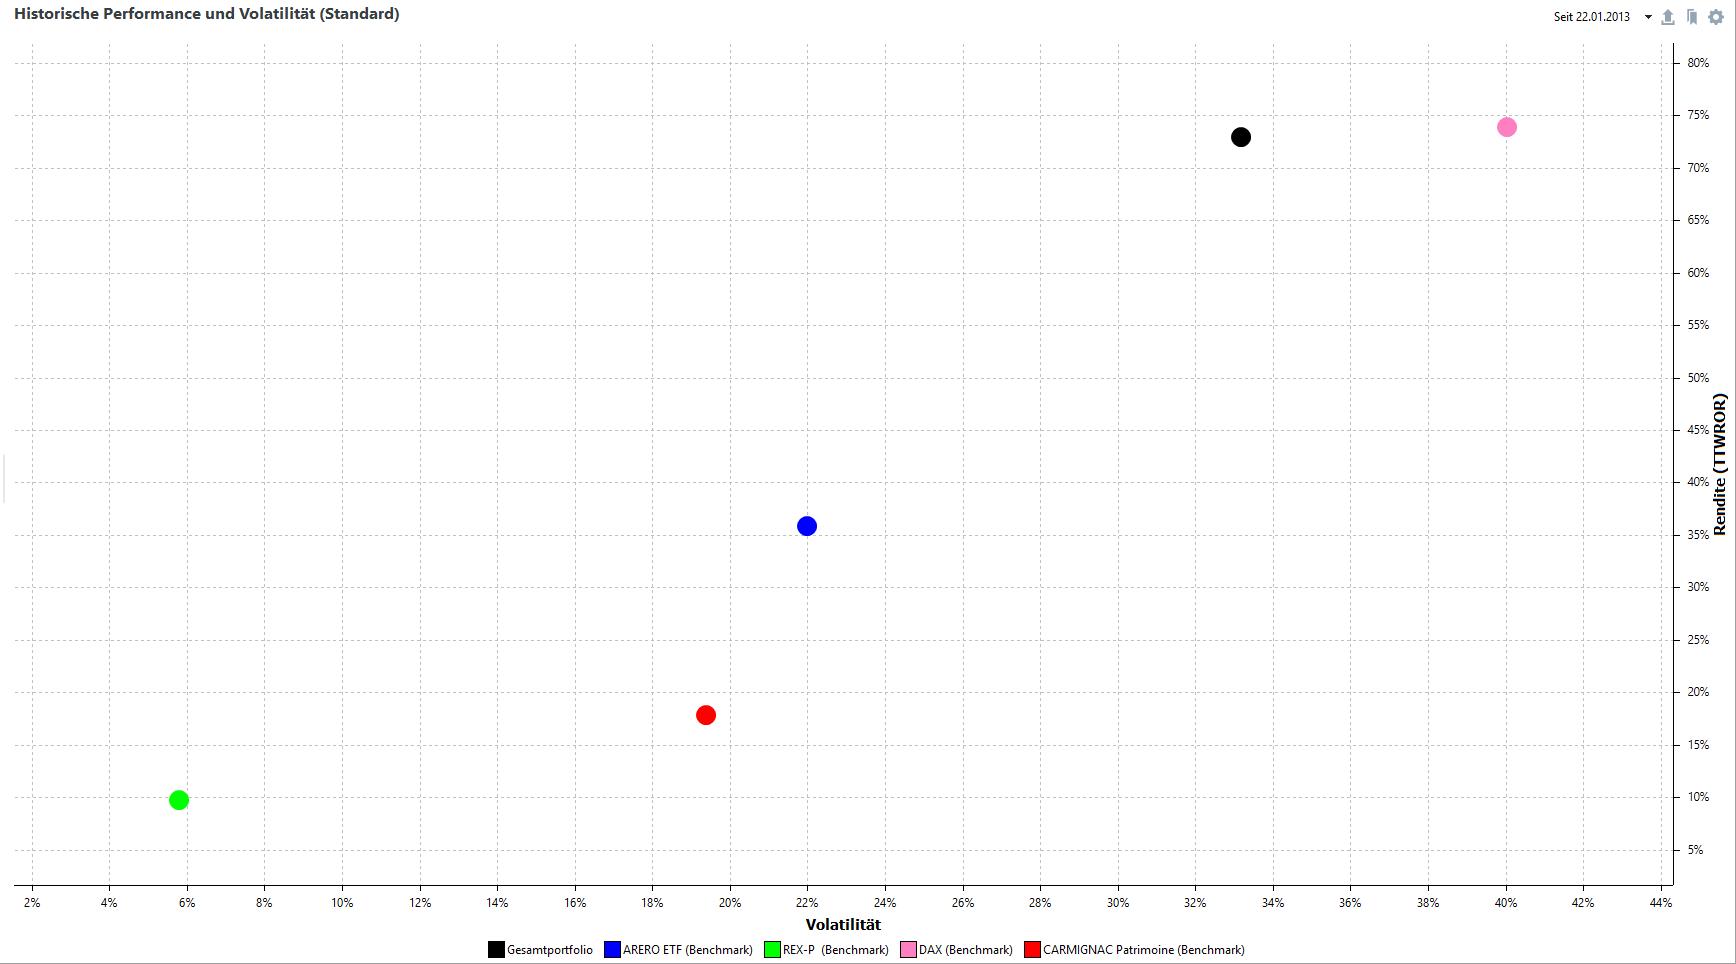 Rendite/Risiko-Chart seit Auflegung am 22.01.2013